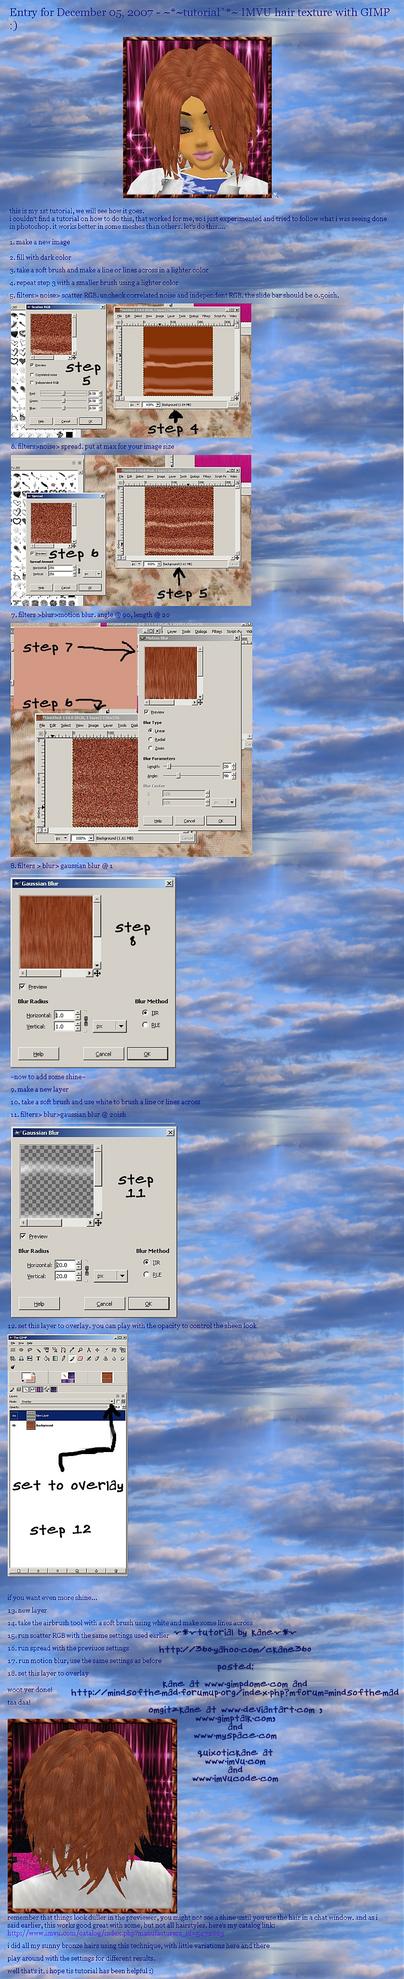 IMVU hair textures with GIMP by omgitzkane